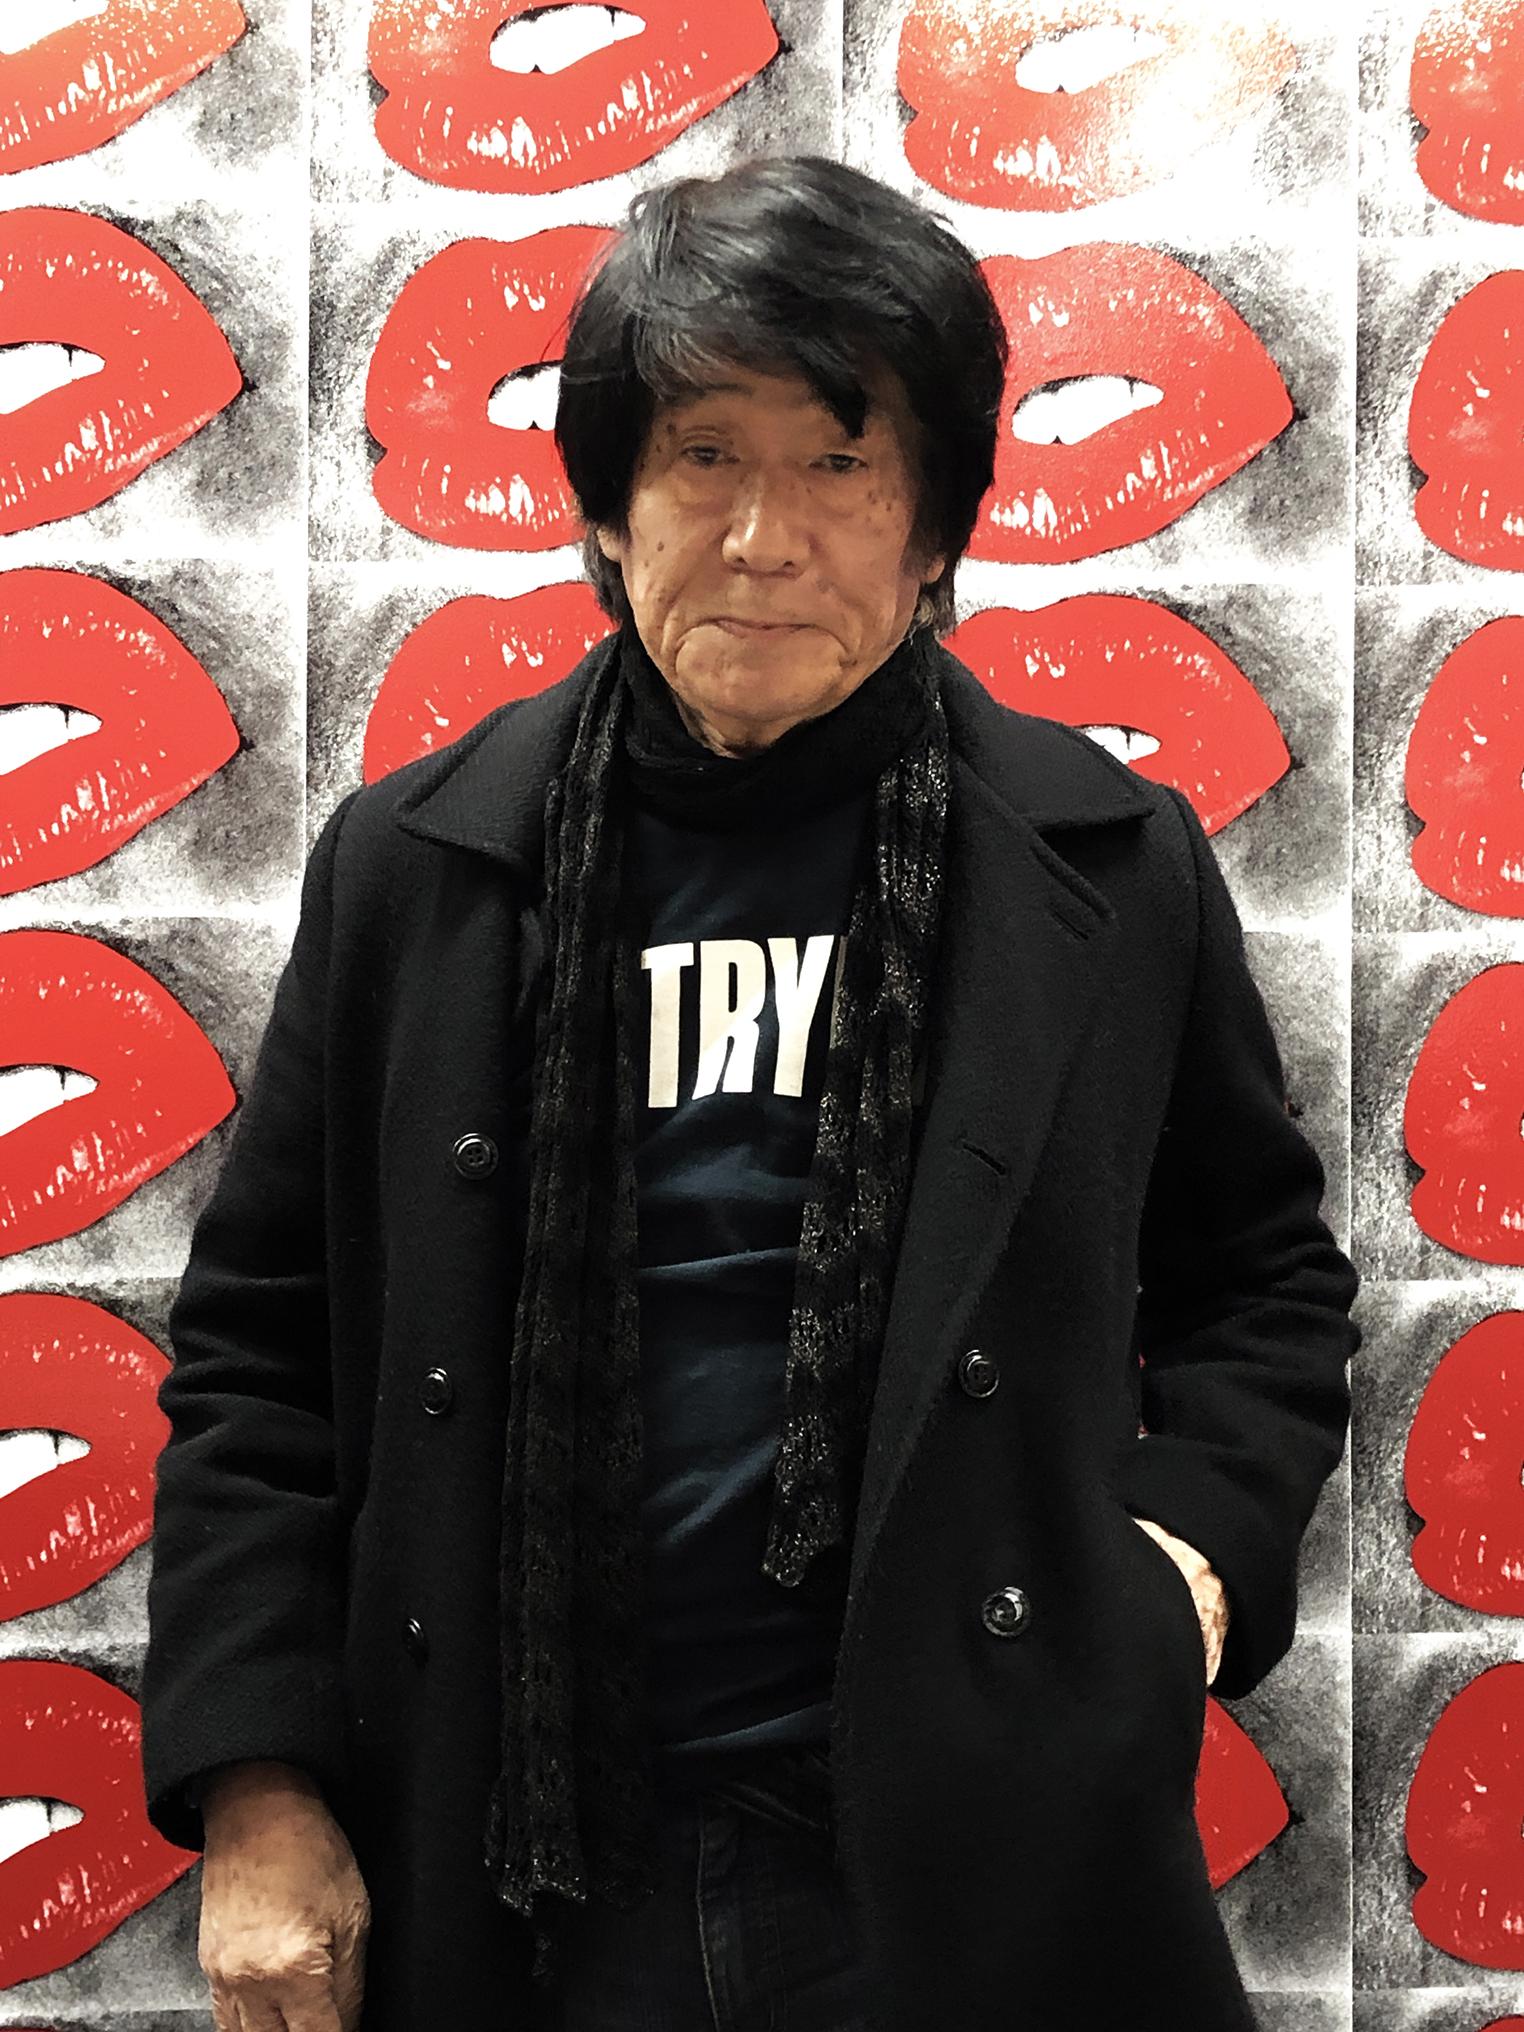 Daido Moriyama Wins $110,000 Hasselblad Award for Photography